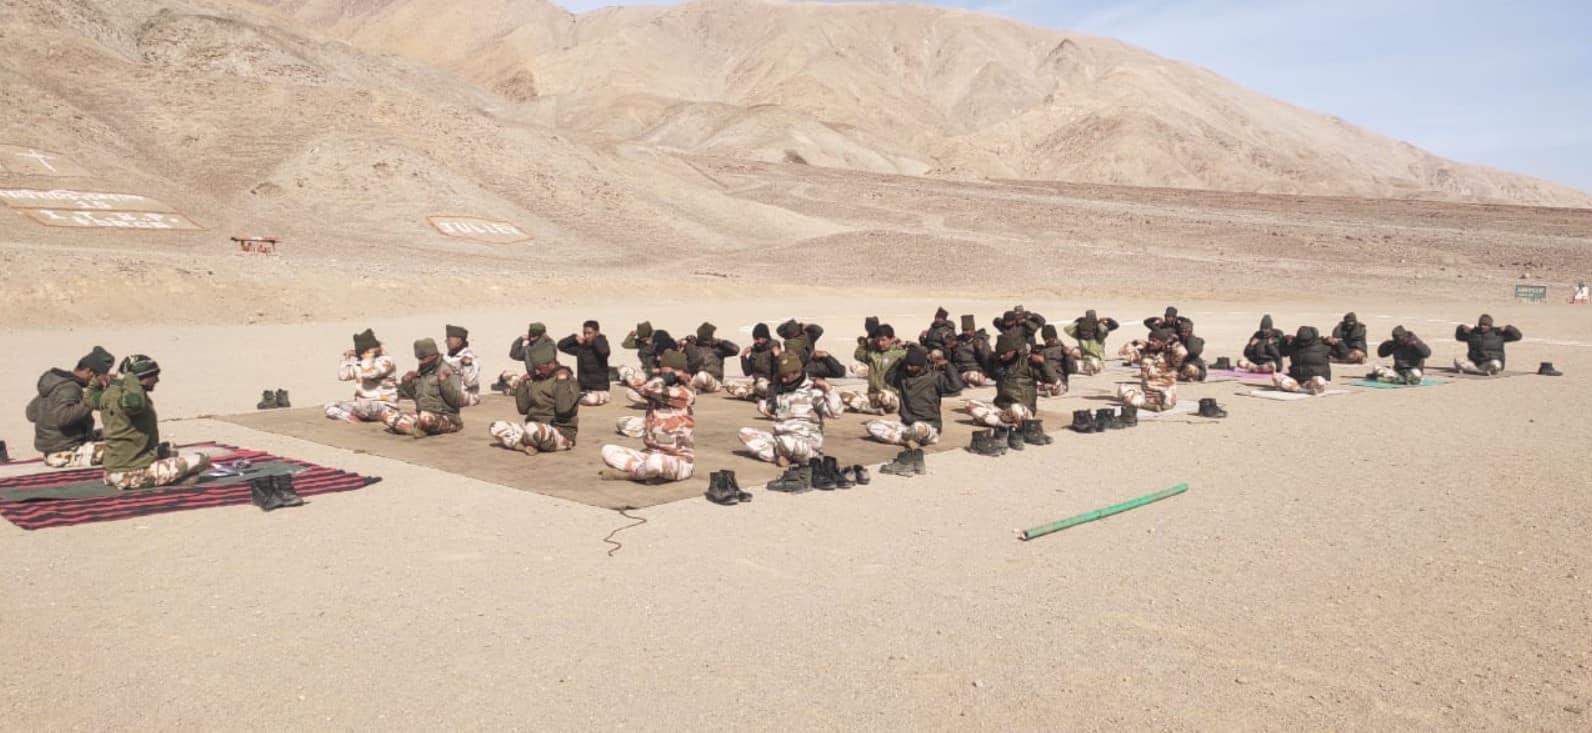 ITBP troops performing Yoga at 18,000 feet